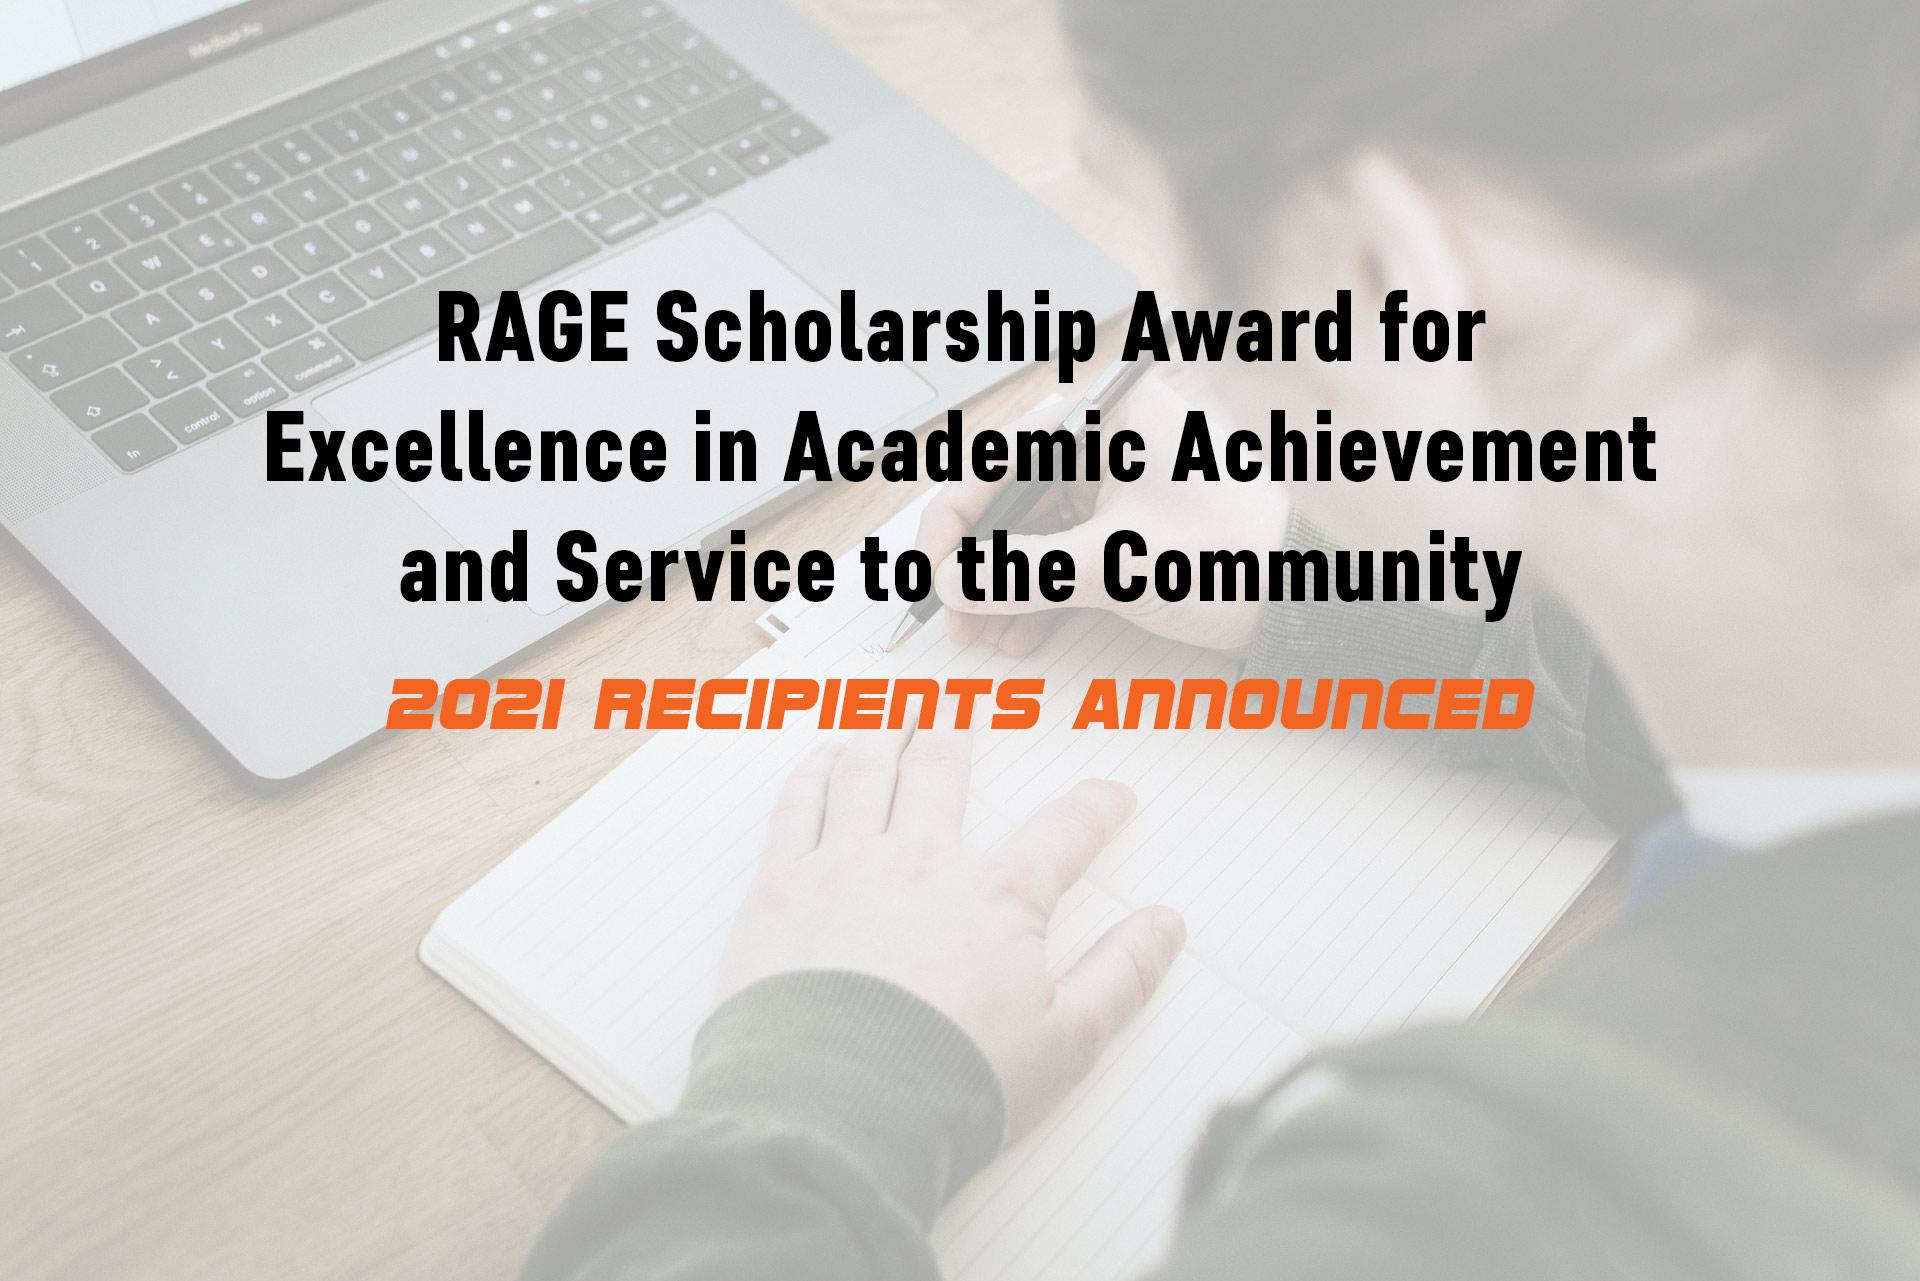 RAGE Scholarship Winners